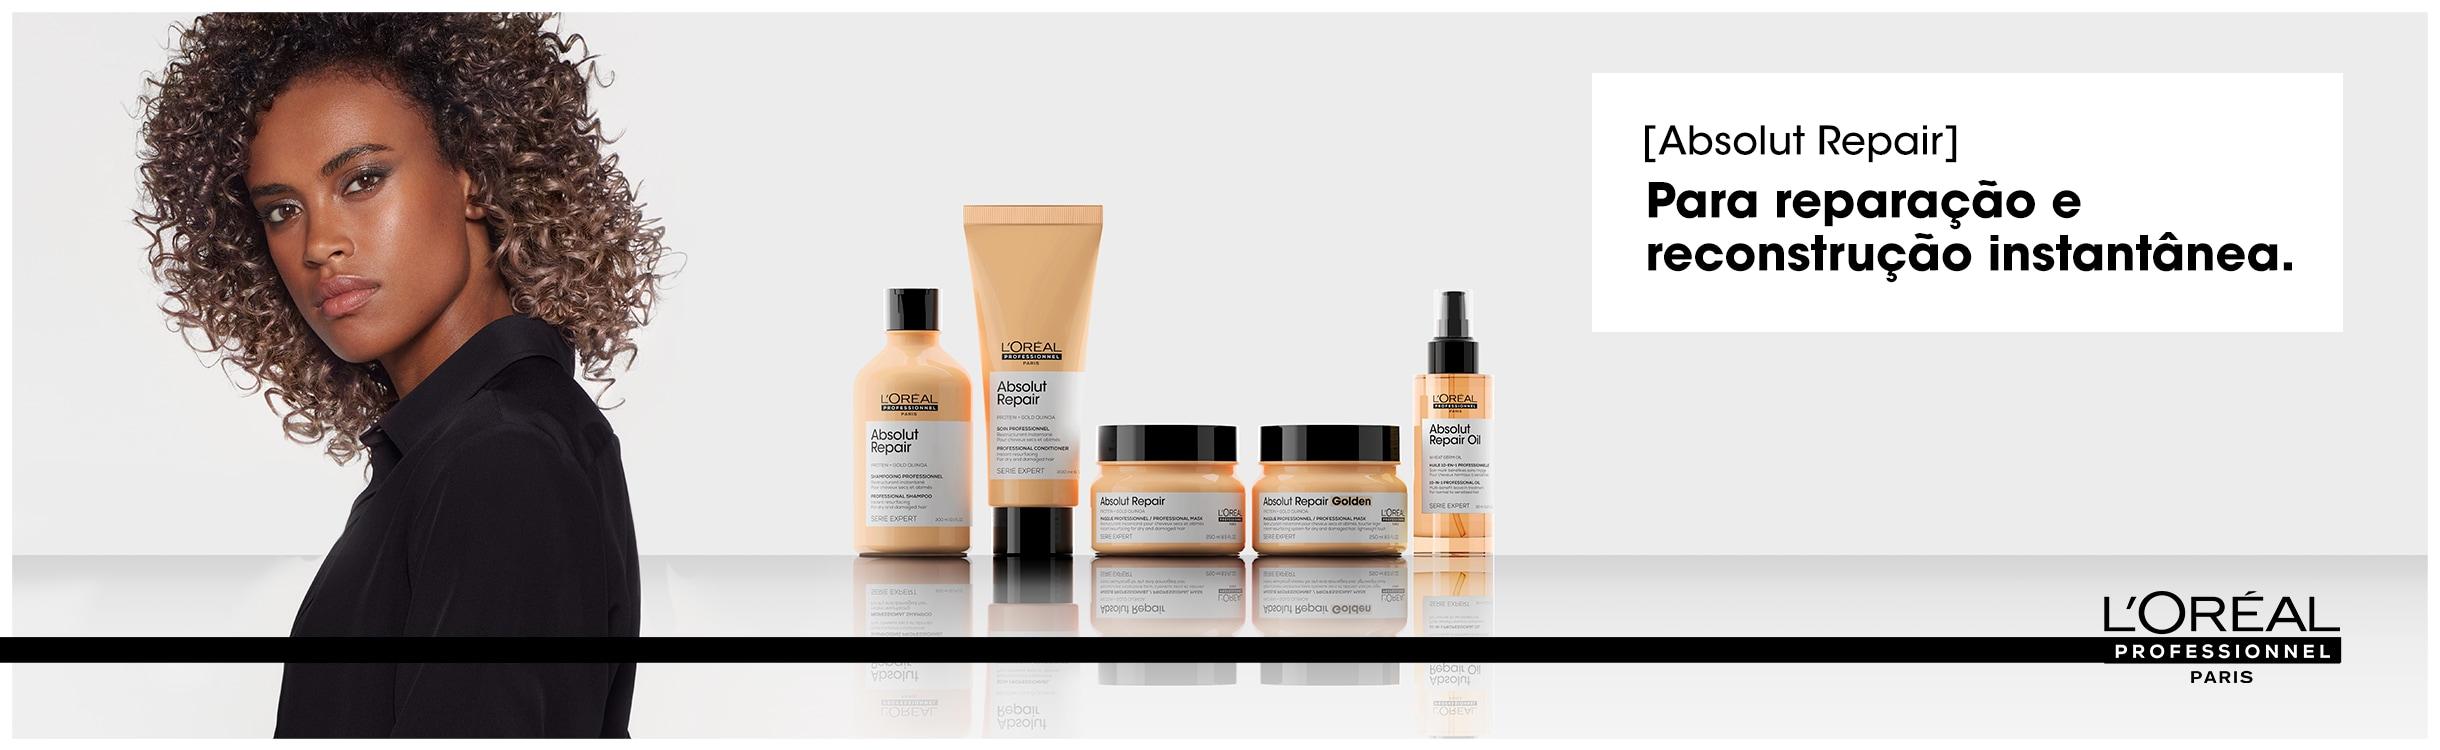 L'Oréal Professionnel Absolut Repair Gold Quinoa + Protein